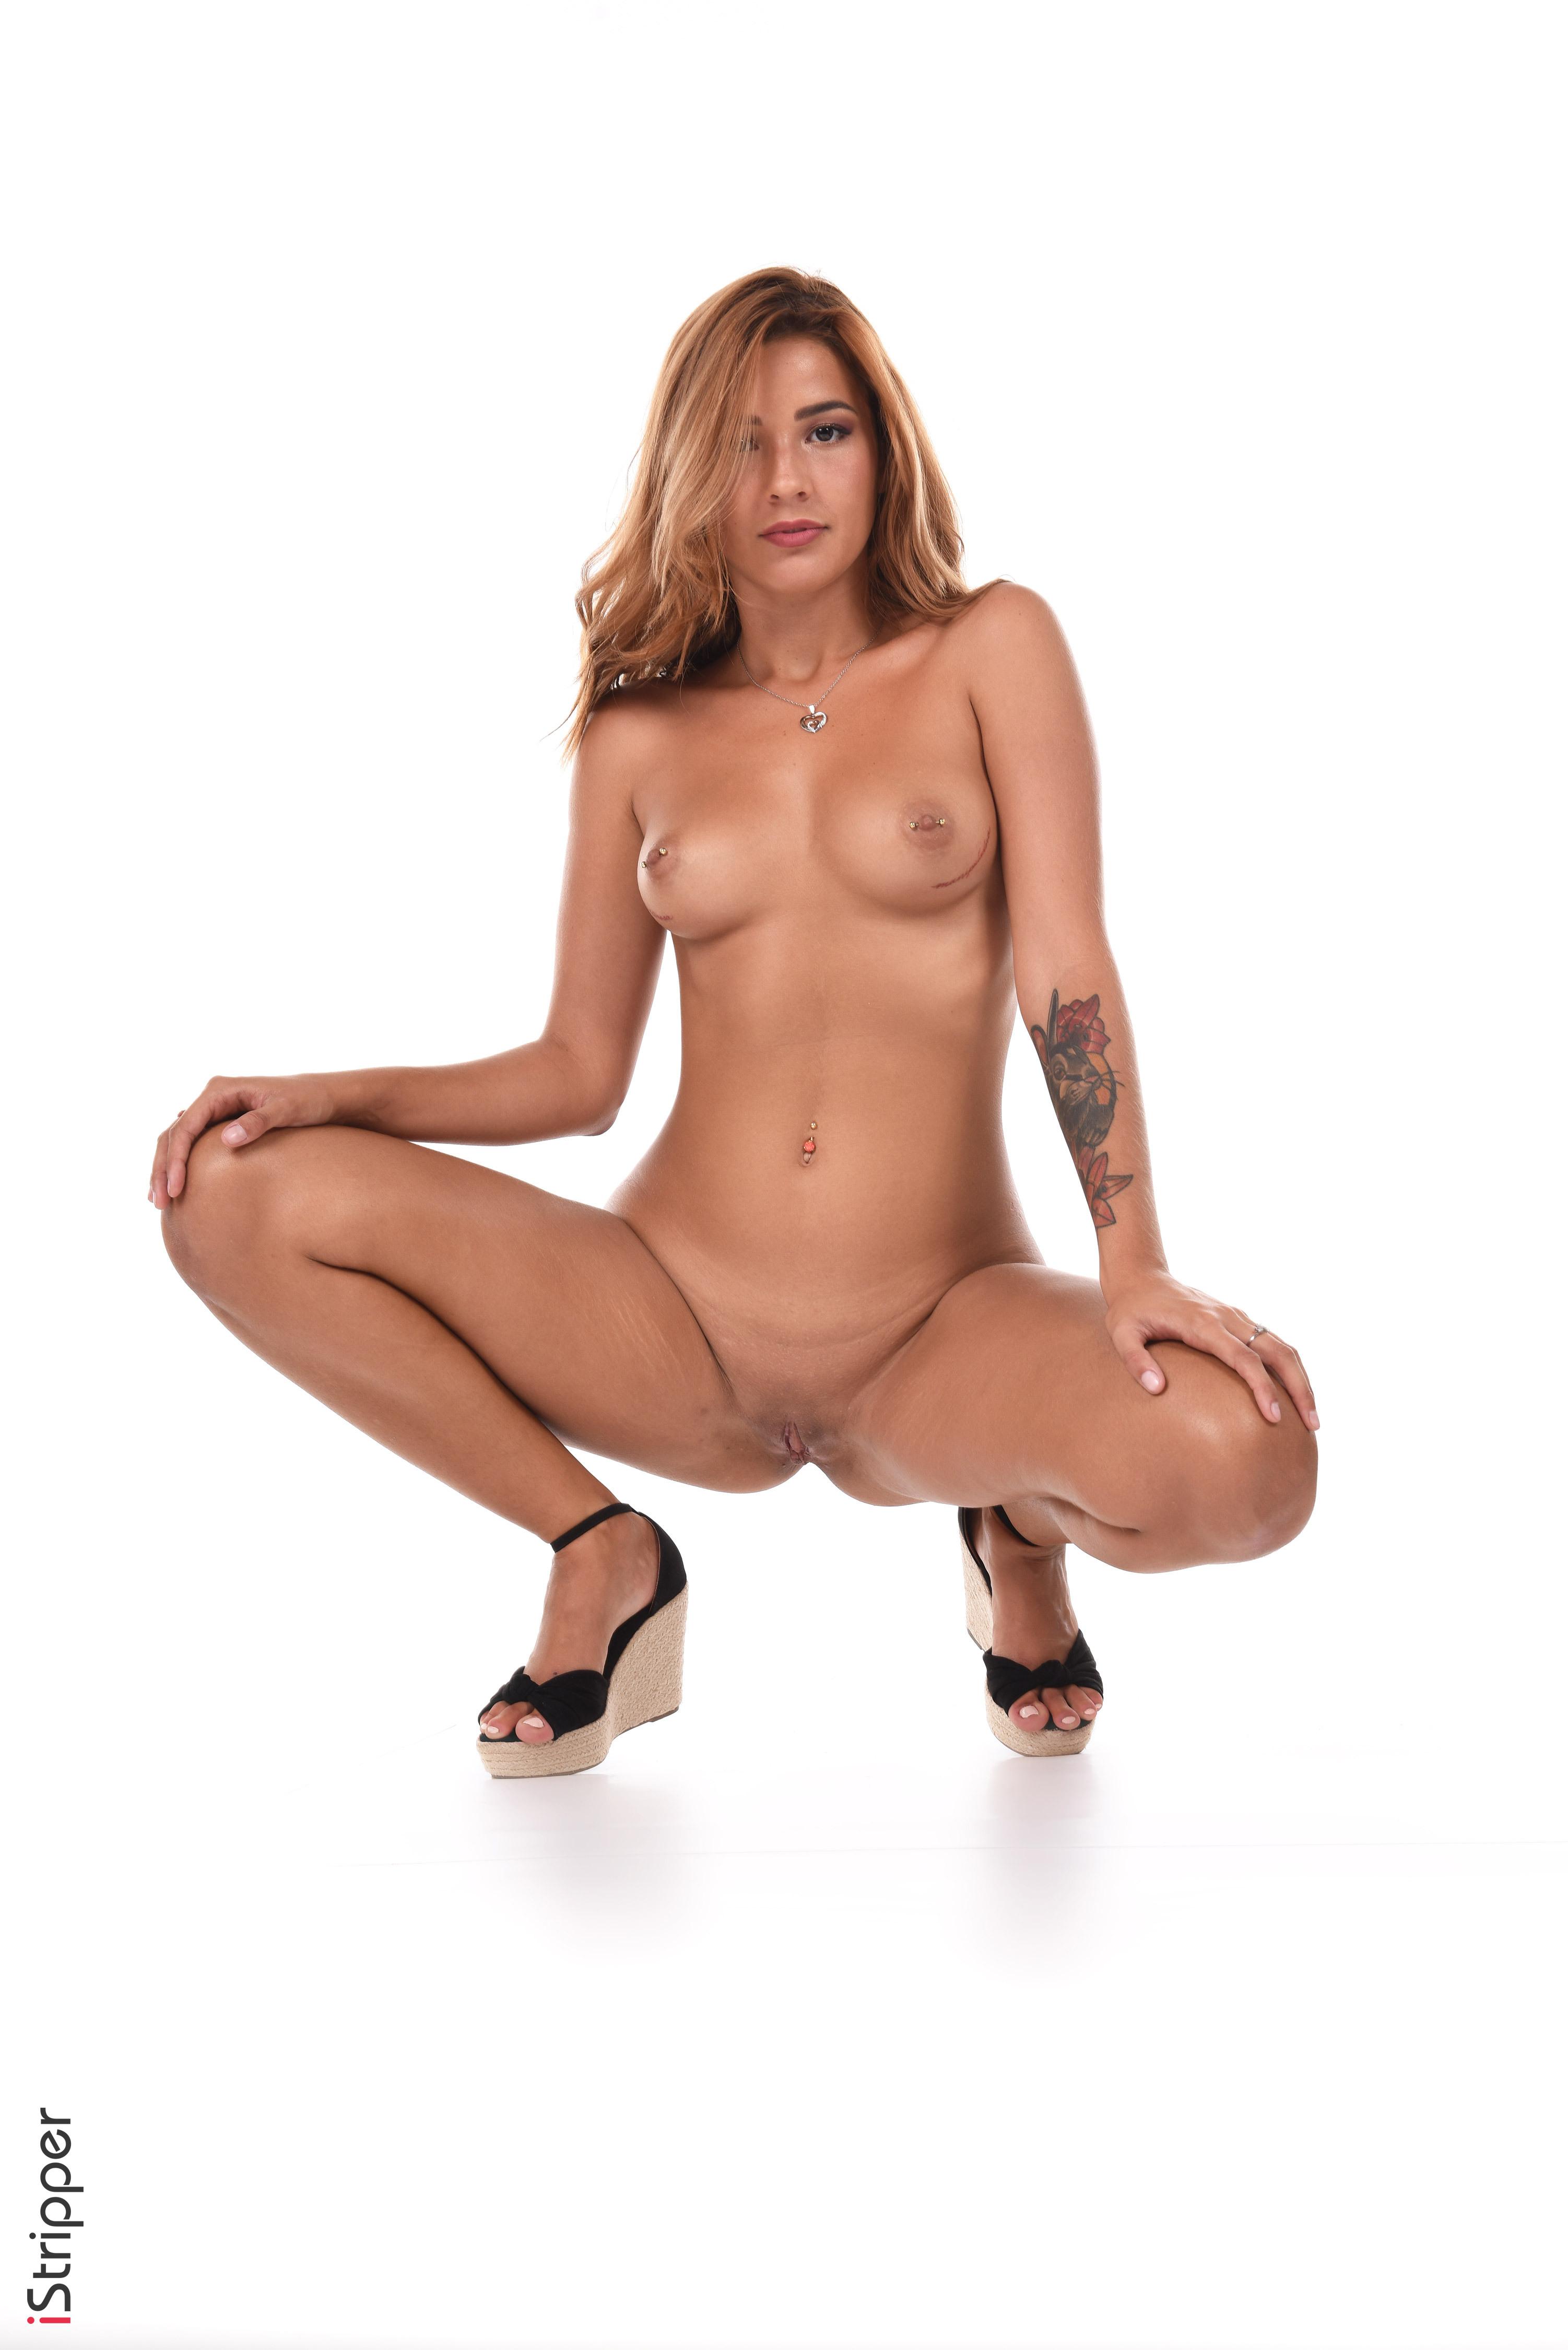 sexy wallpaper girls